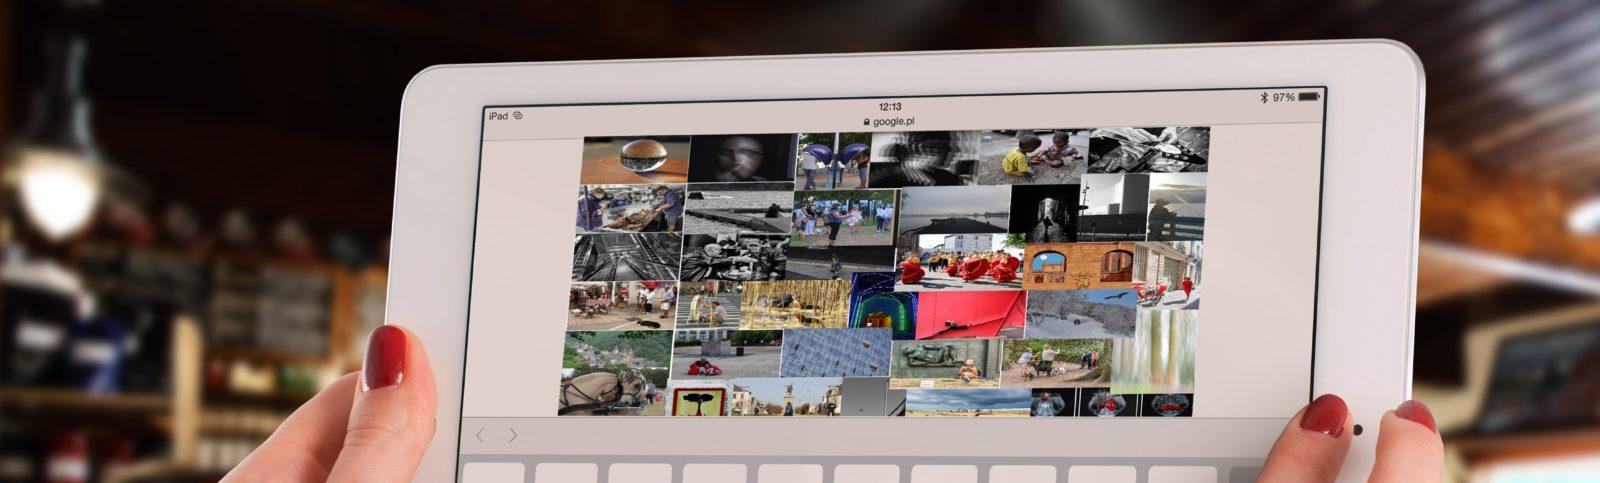 ACAP exposition virtuelle 2021